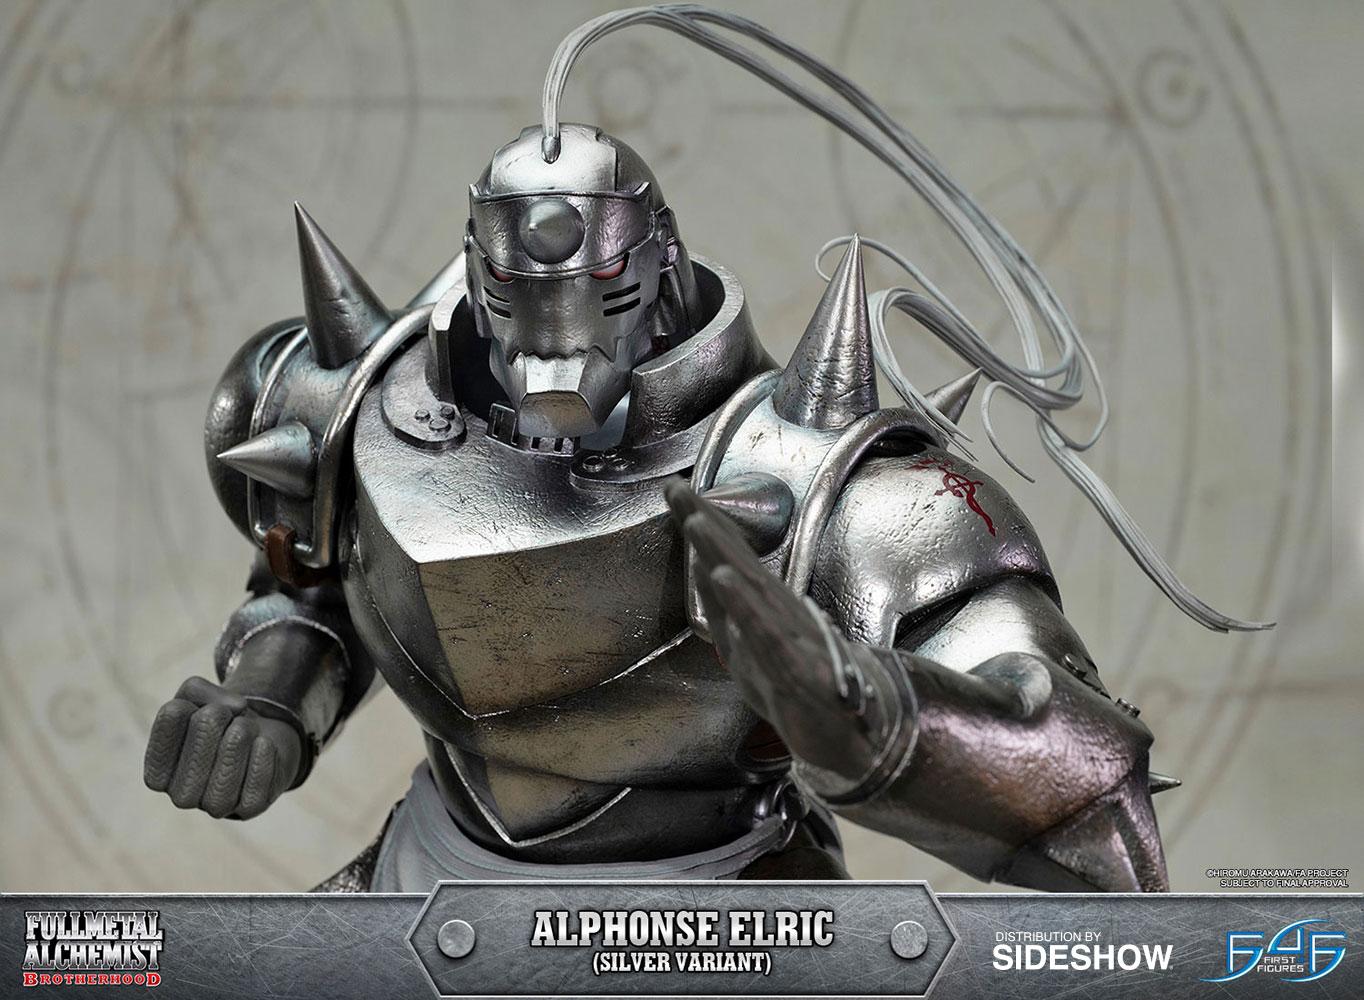 Al Elric fullmetal alchemist alphonse elric silver variant statue by